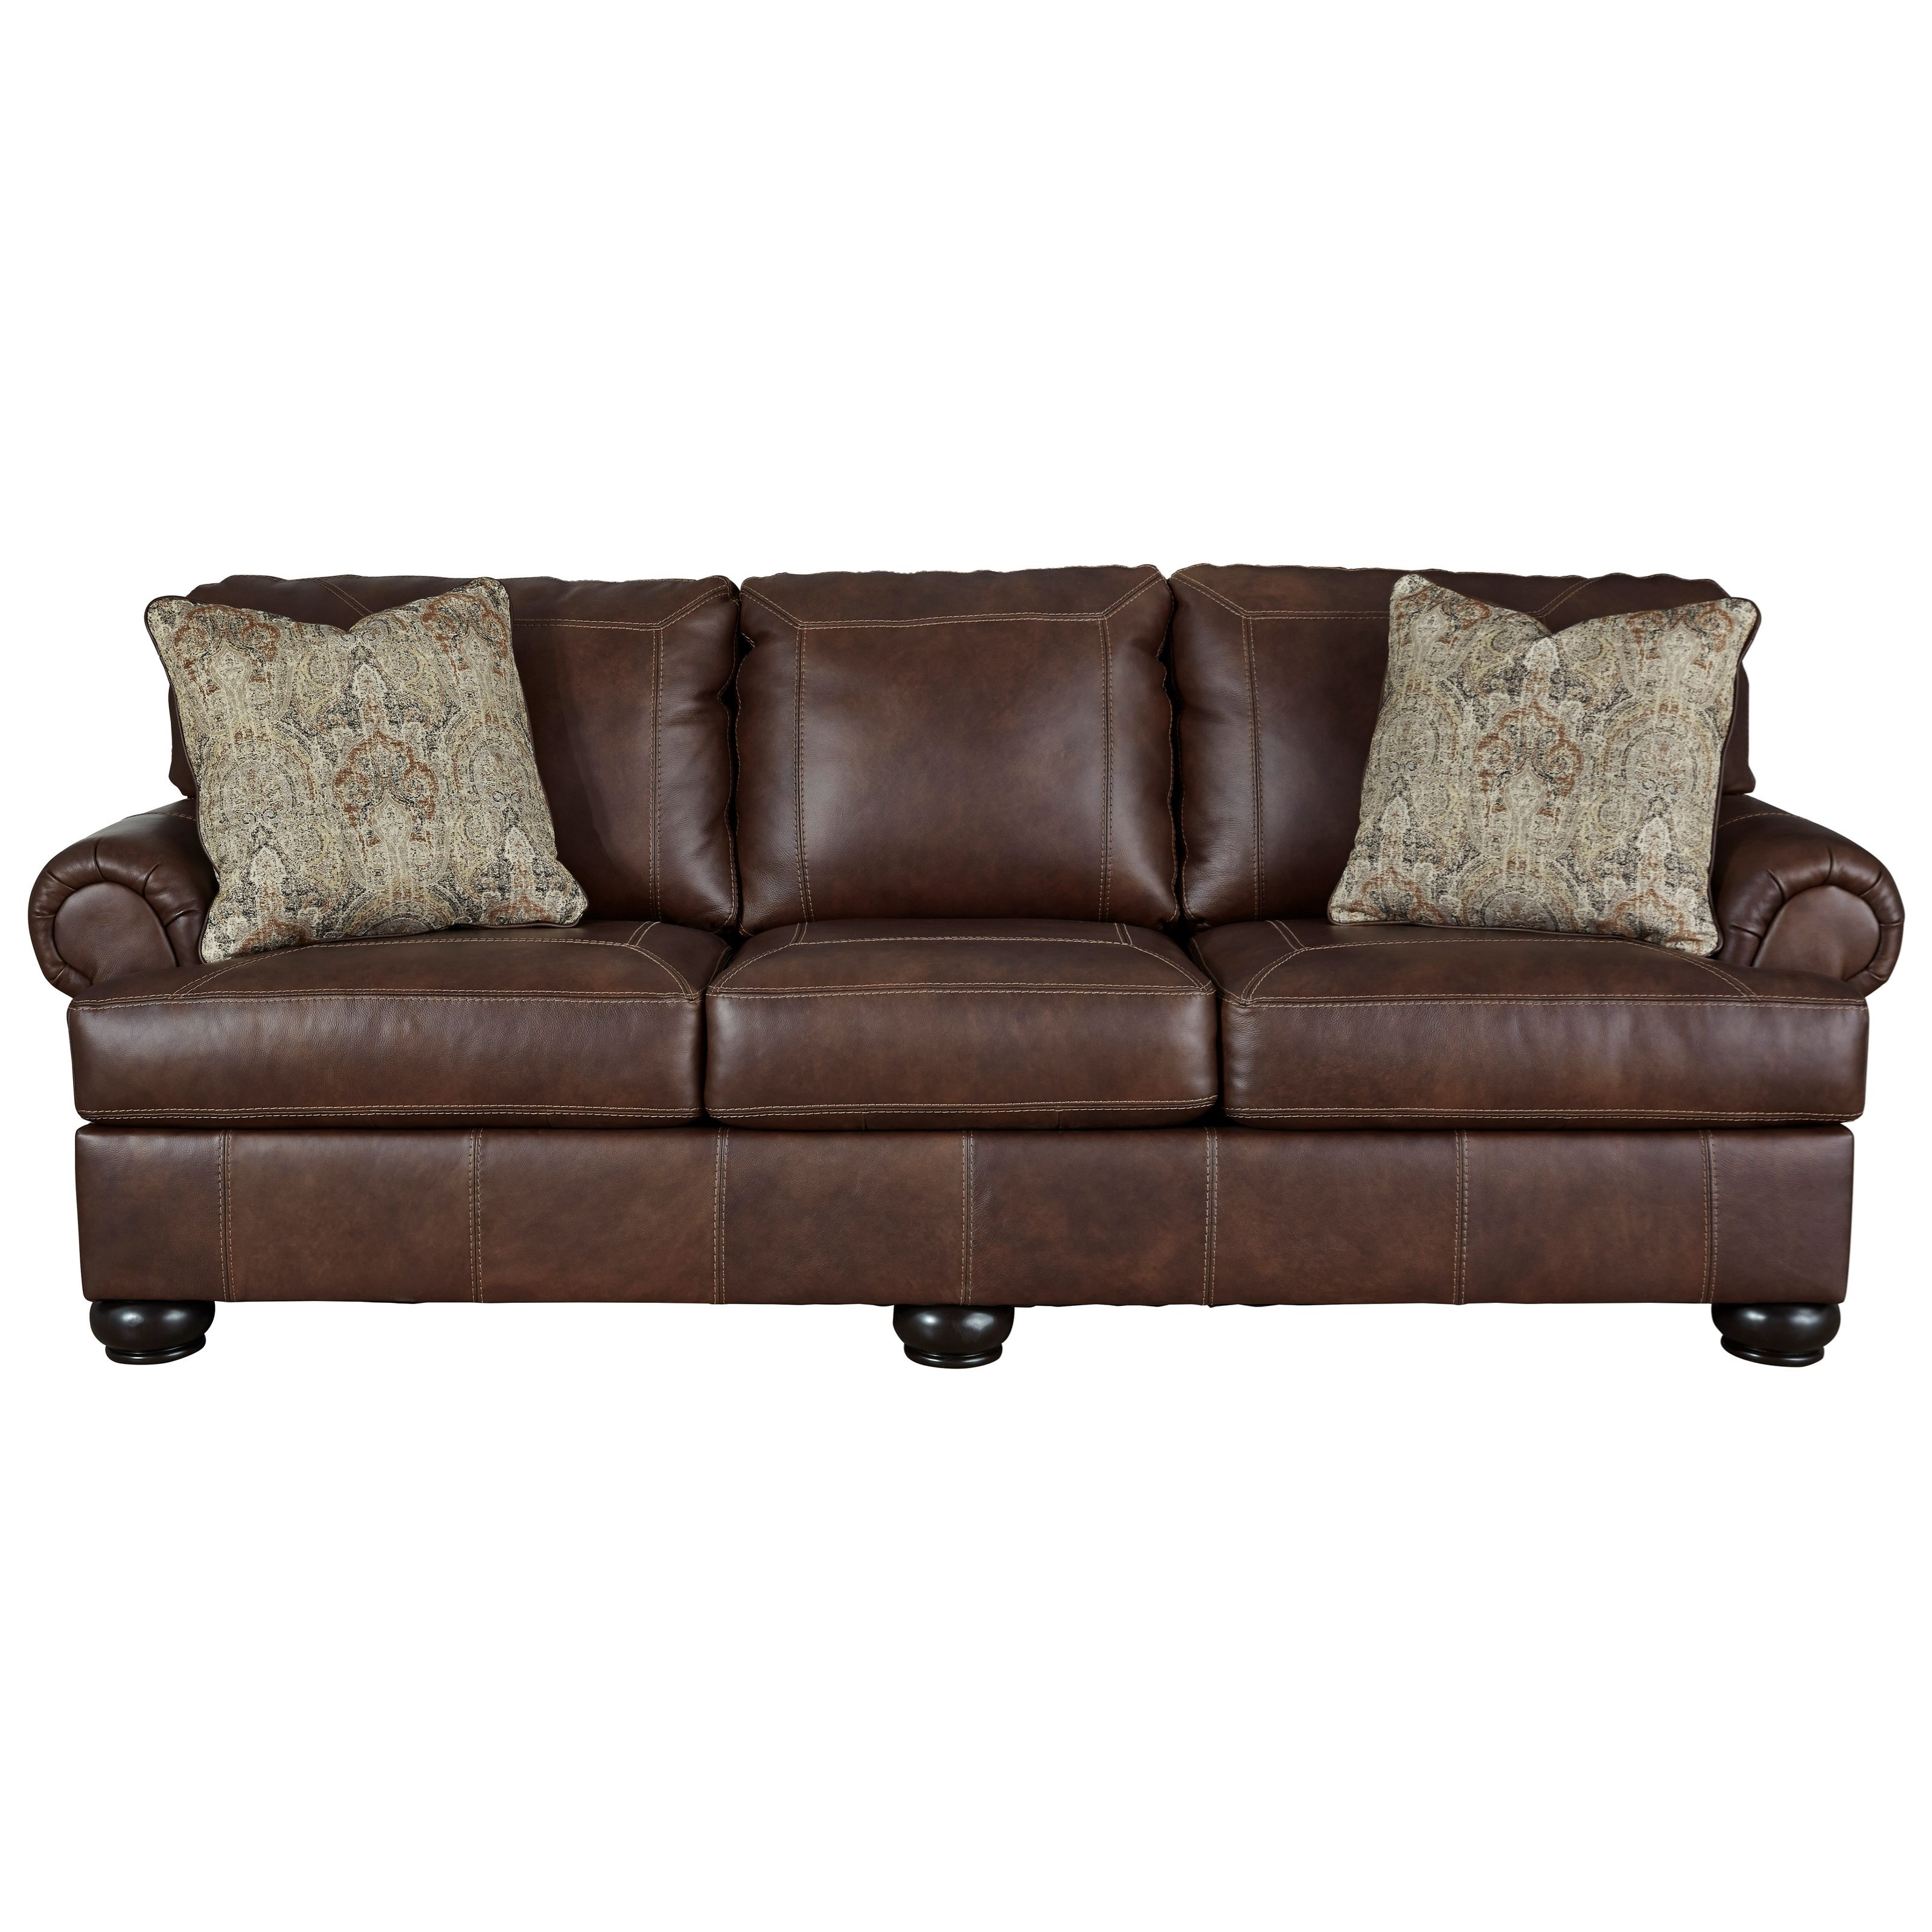 Bearmerton Sofa by Signature at Walker's Furniture